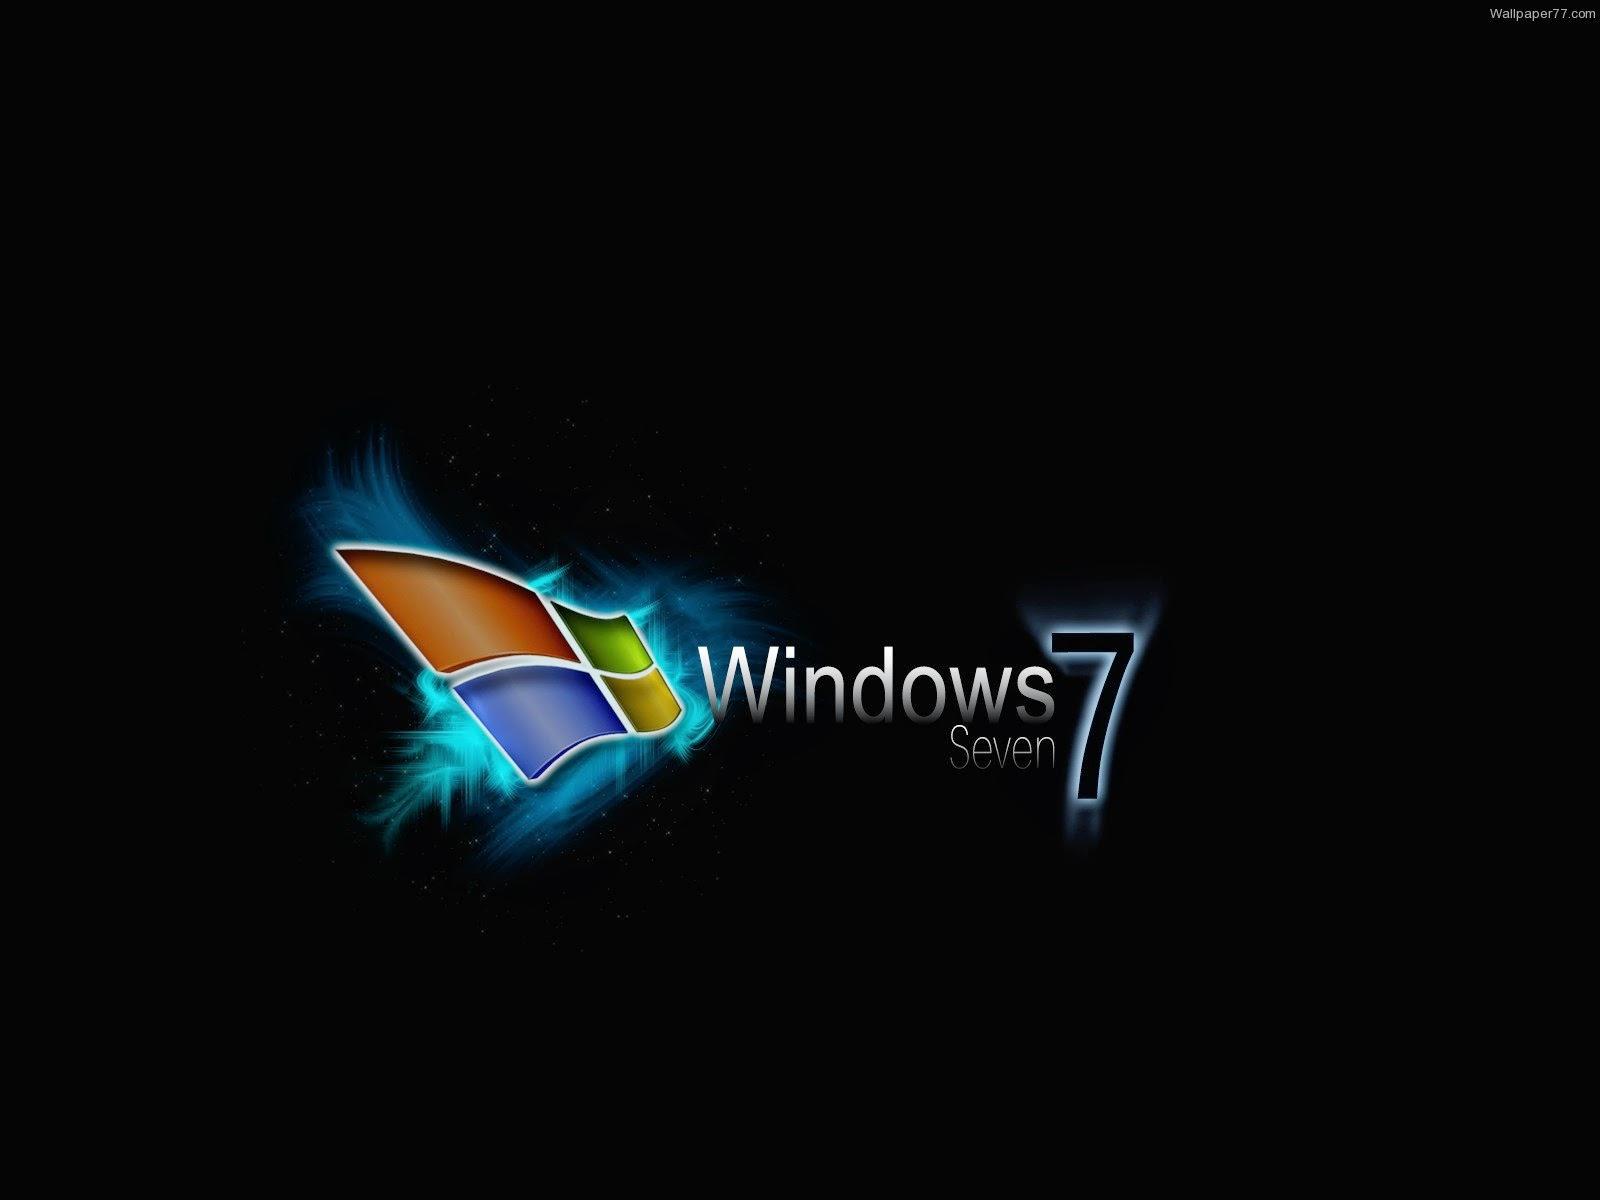 Wallpaper Animated Wallpaper Windows 7 Auto Design Tech 1600x1200